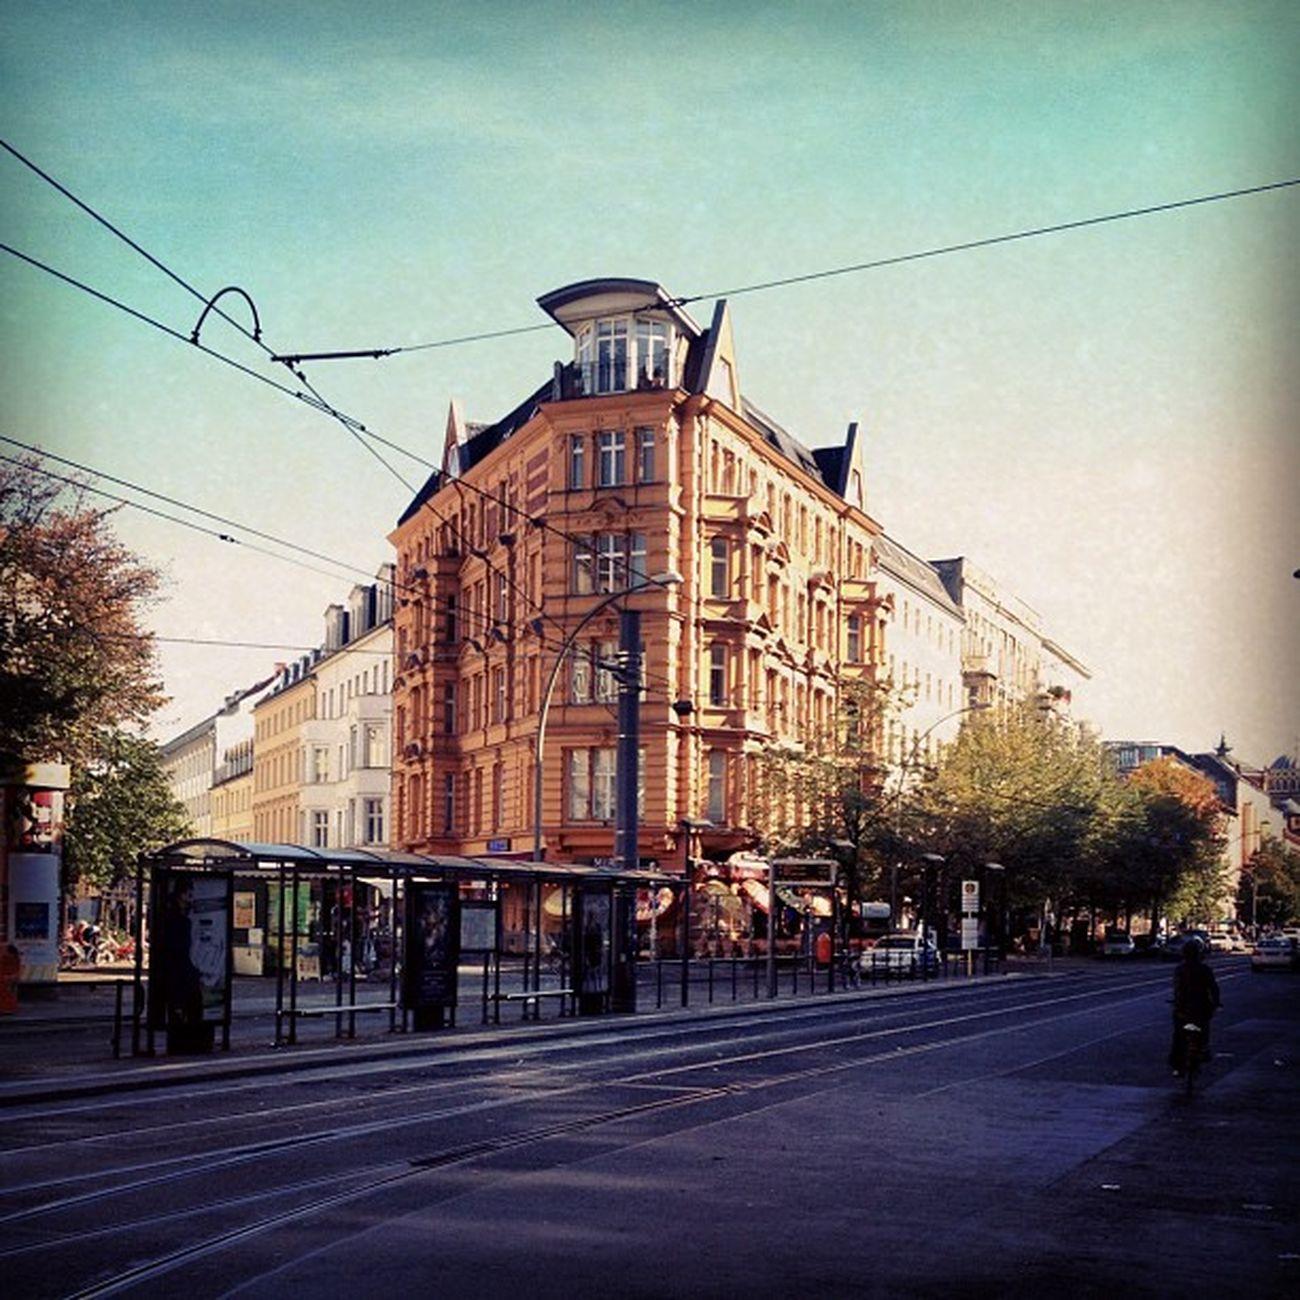 #architecture #Berlin #igersberlin #instagood #tweegram #photooftheday #follow #instamod #igers #picoftheday #instragamhub #instadaily #insta_germany #bestoftheday #igdaily #webstagram #instragramers #ig_special #igersberlin #gf_germany #all_shots #oranie IGDaily Tweegram Instagood Webstagram Instadaily Igersberlin Insta_germany Gf_germany Architecture Instragramers Berlin Ig_special Photooftheday Instragamhub Picoftheday Instamod Follow Oranienburgertor All_shots Bestoftheday Igers